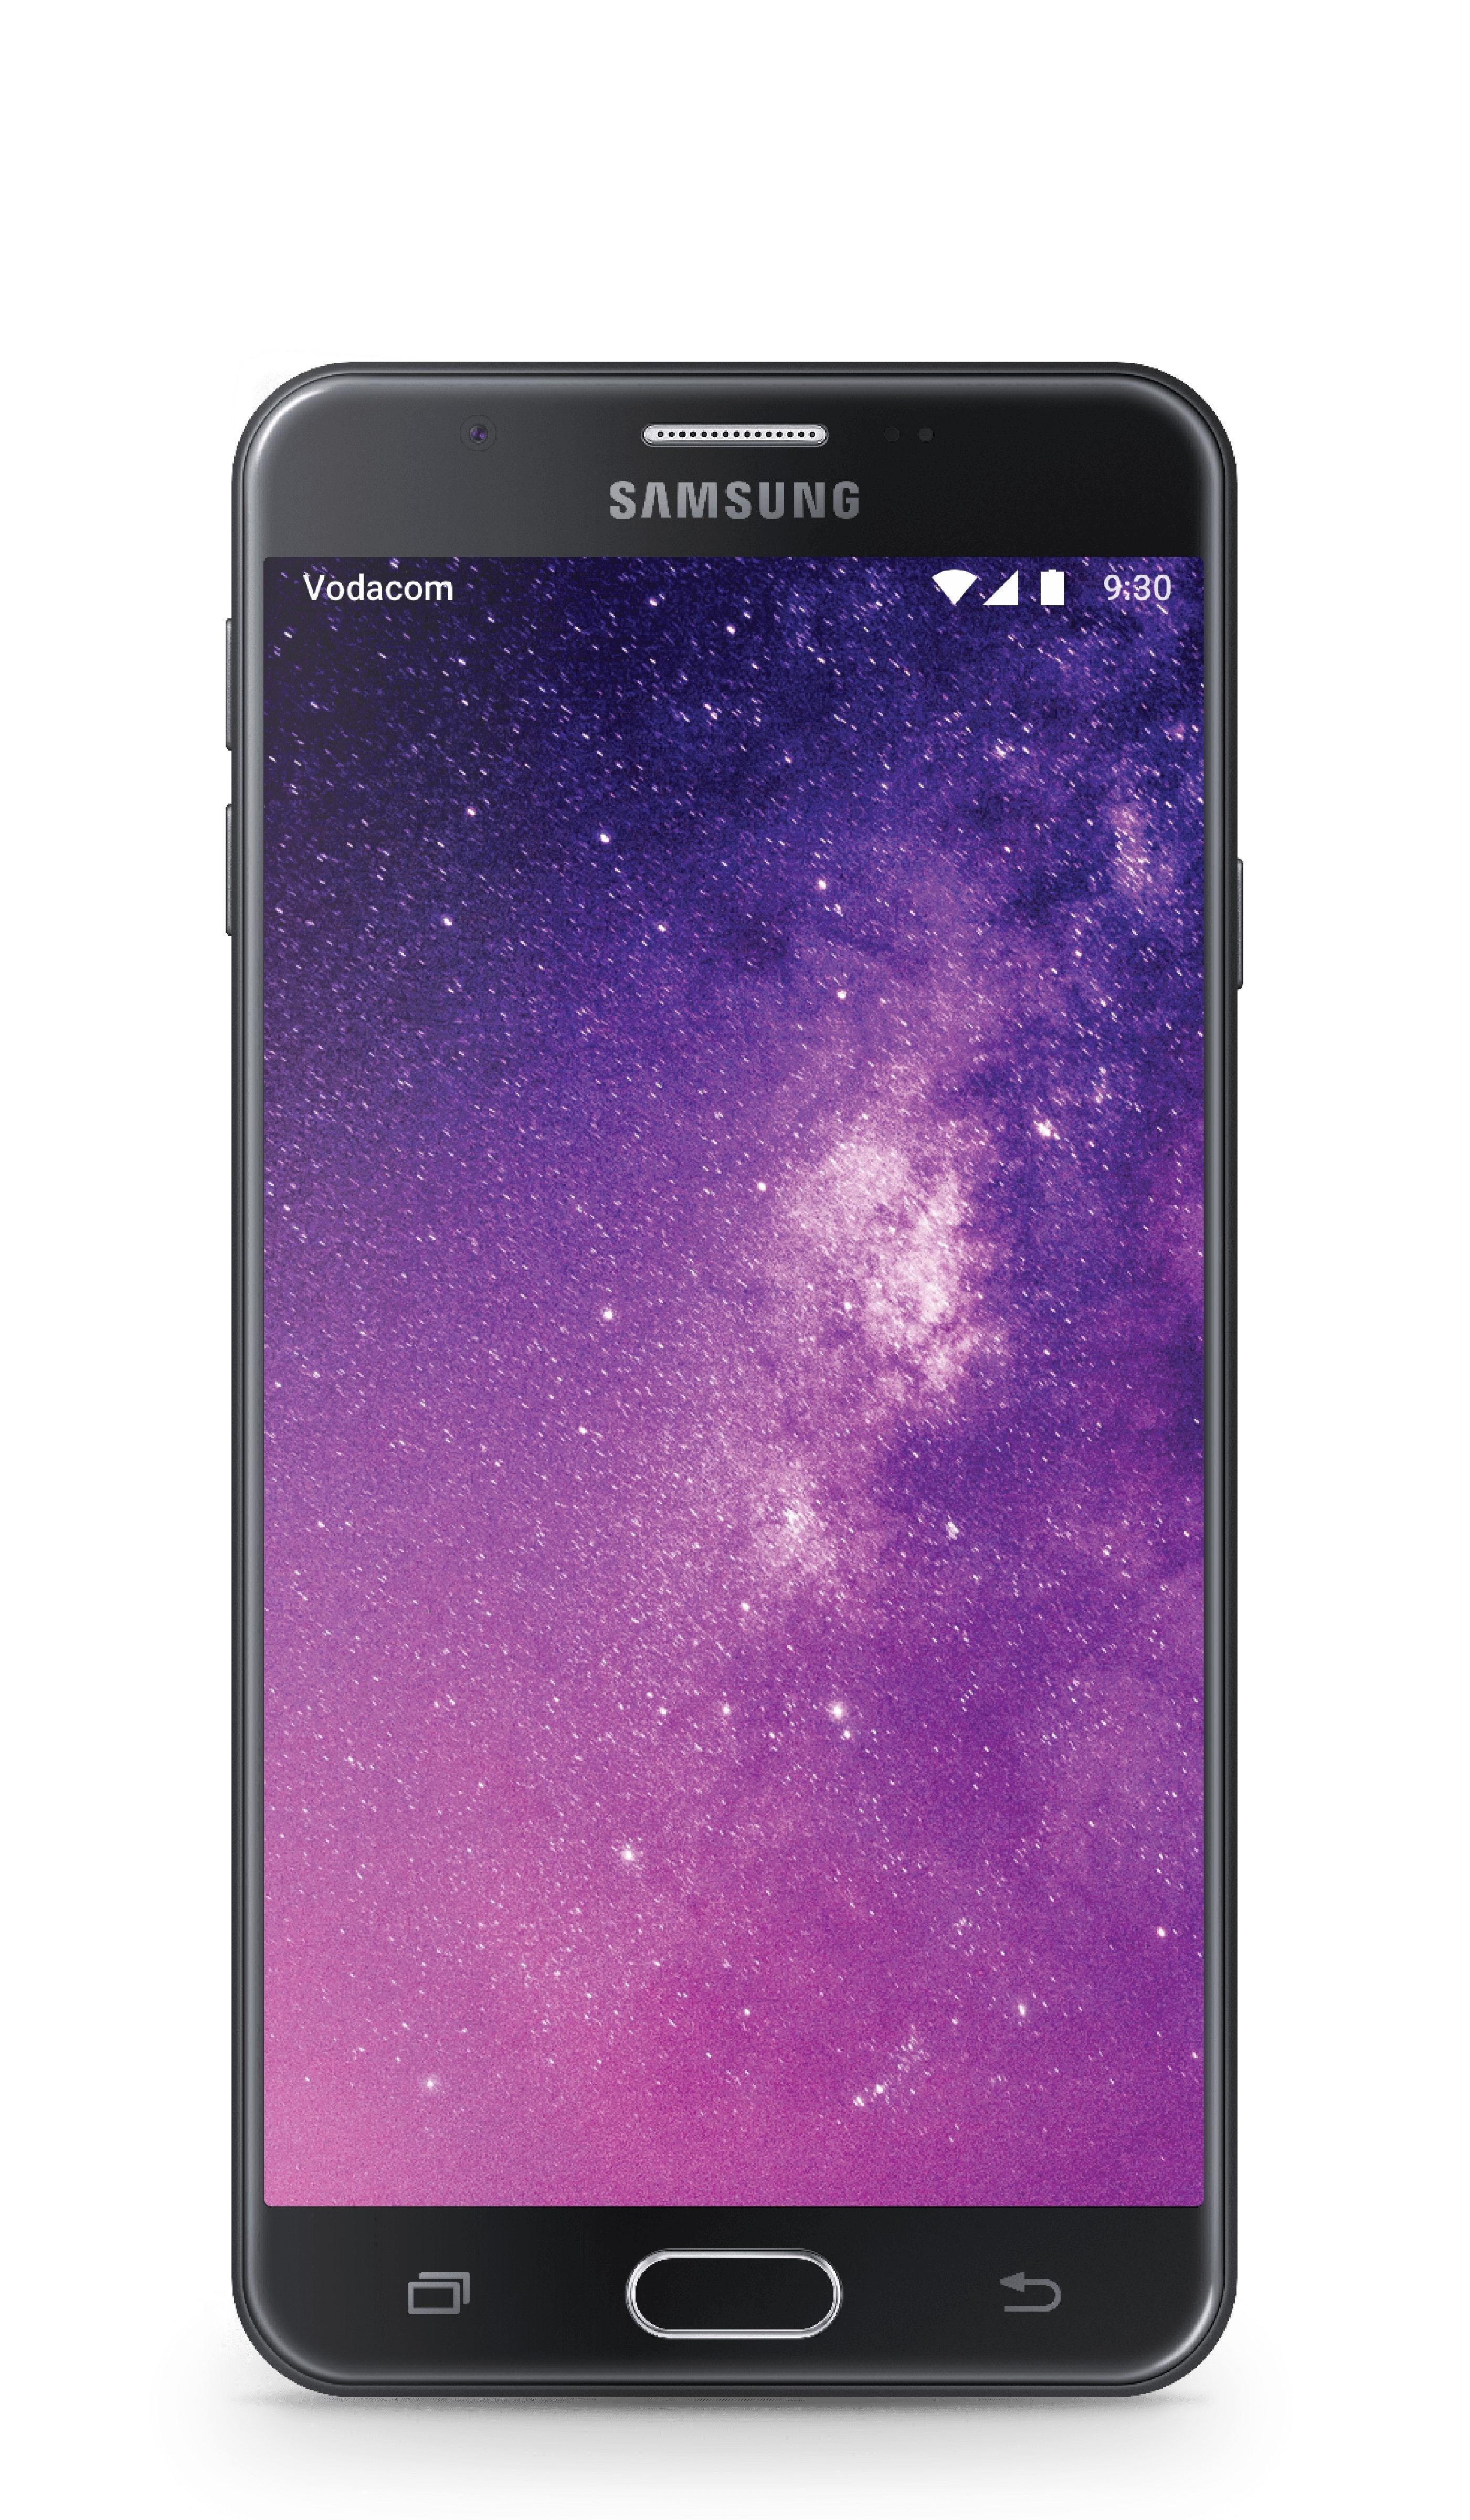 Samsung Galaxy J5 Prime image